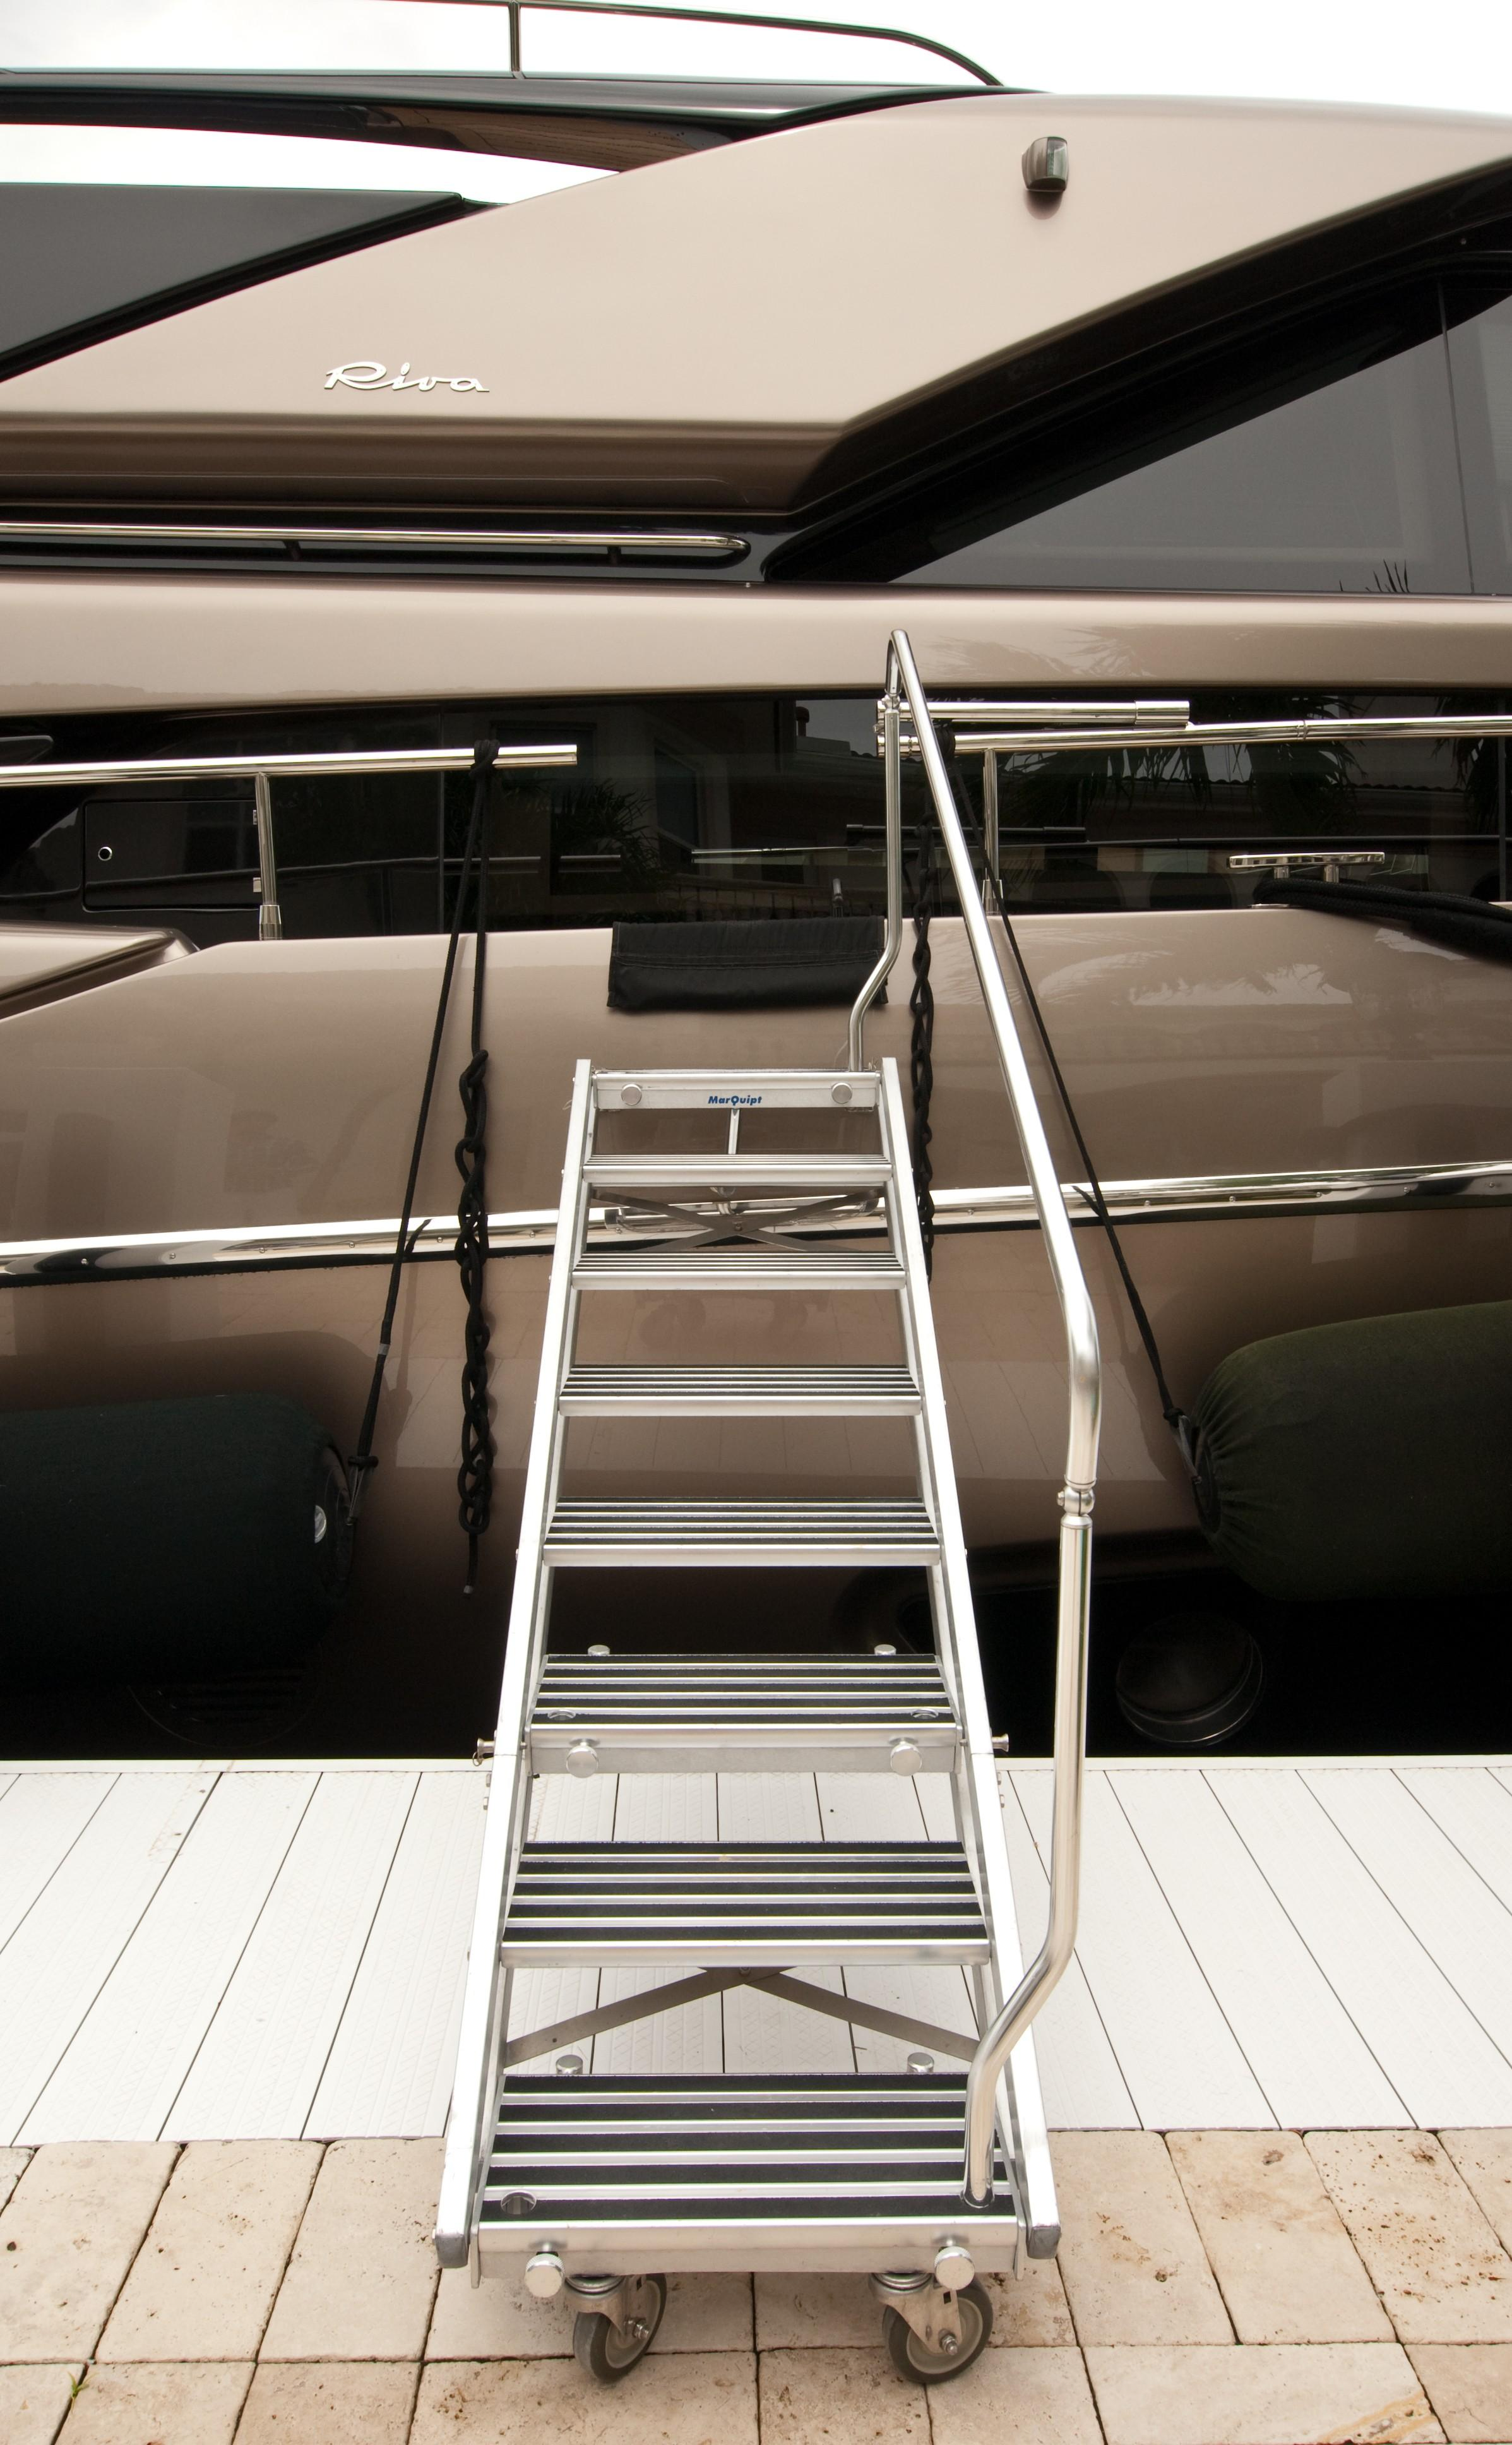 2012 Riva 86 Domino - Boarding Ladder